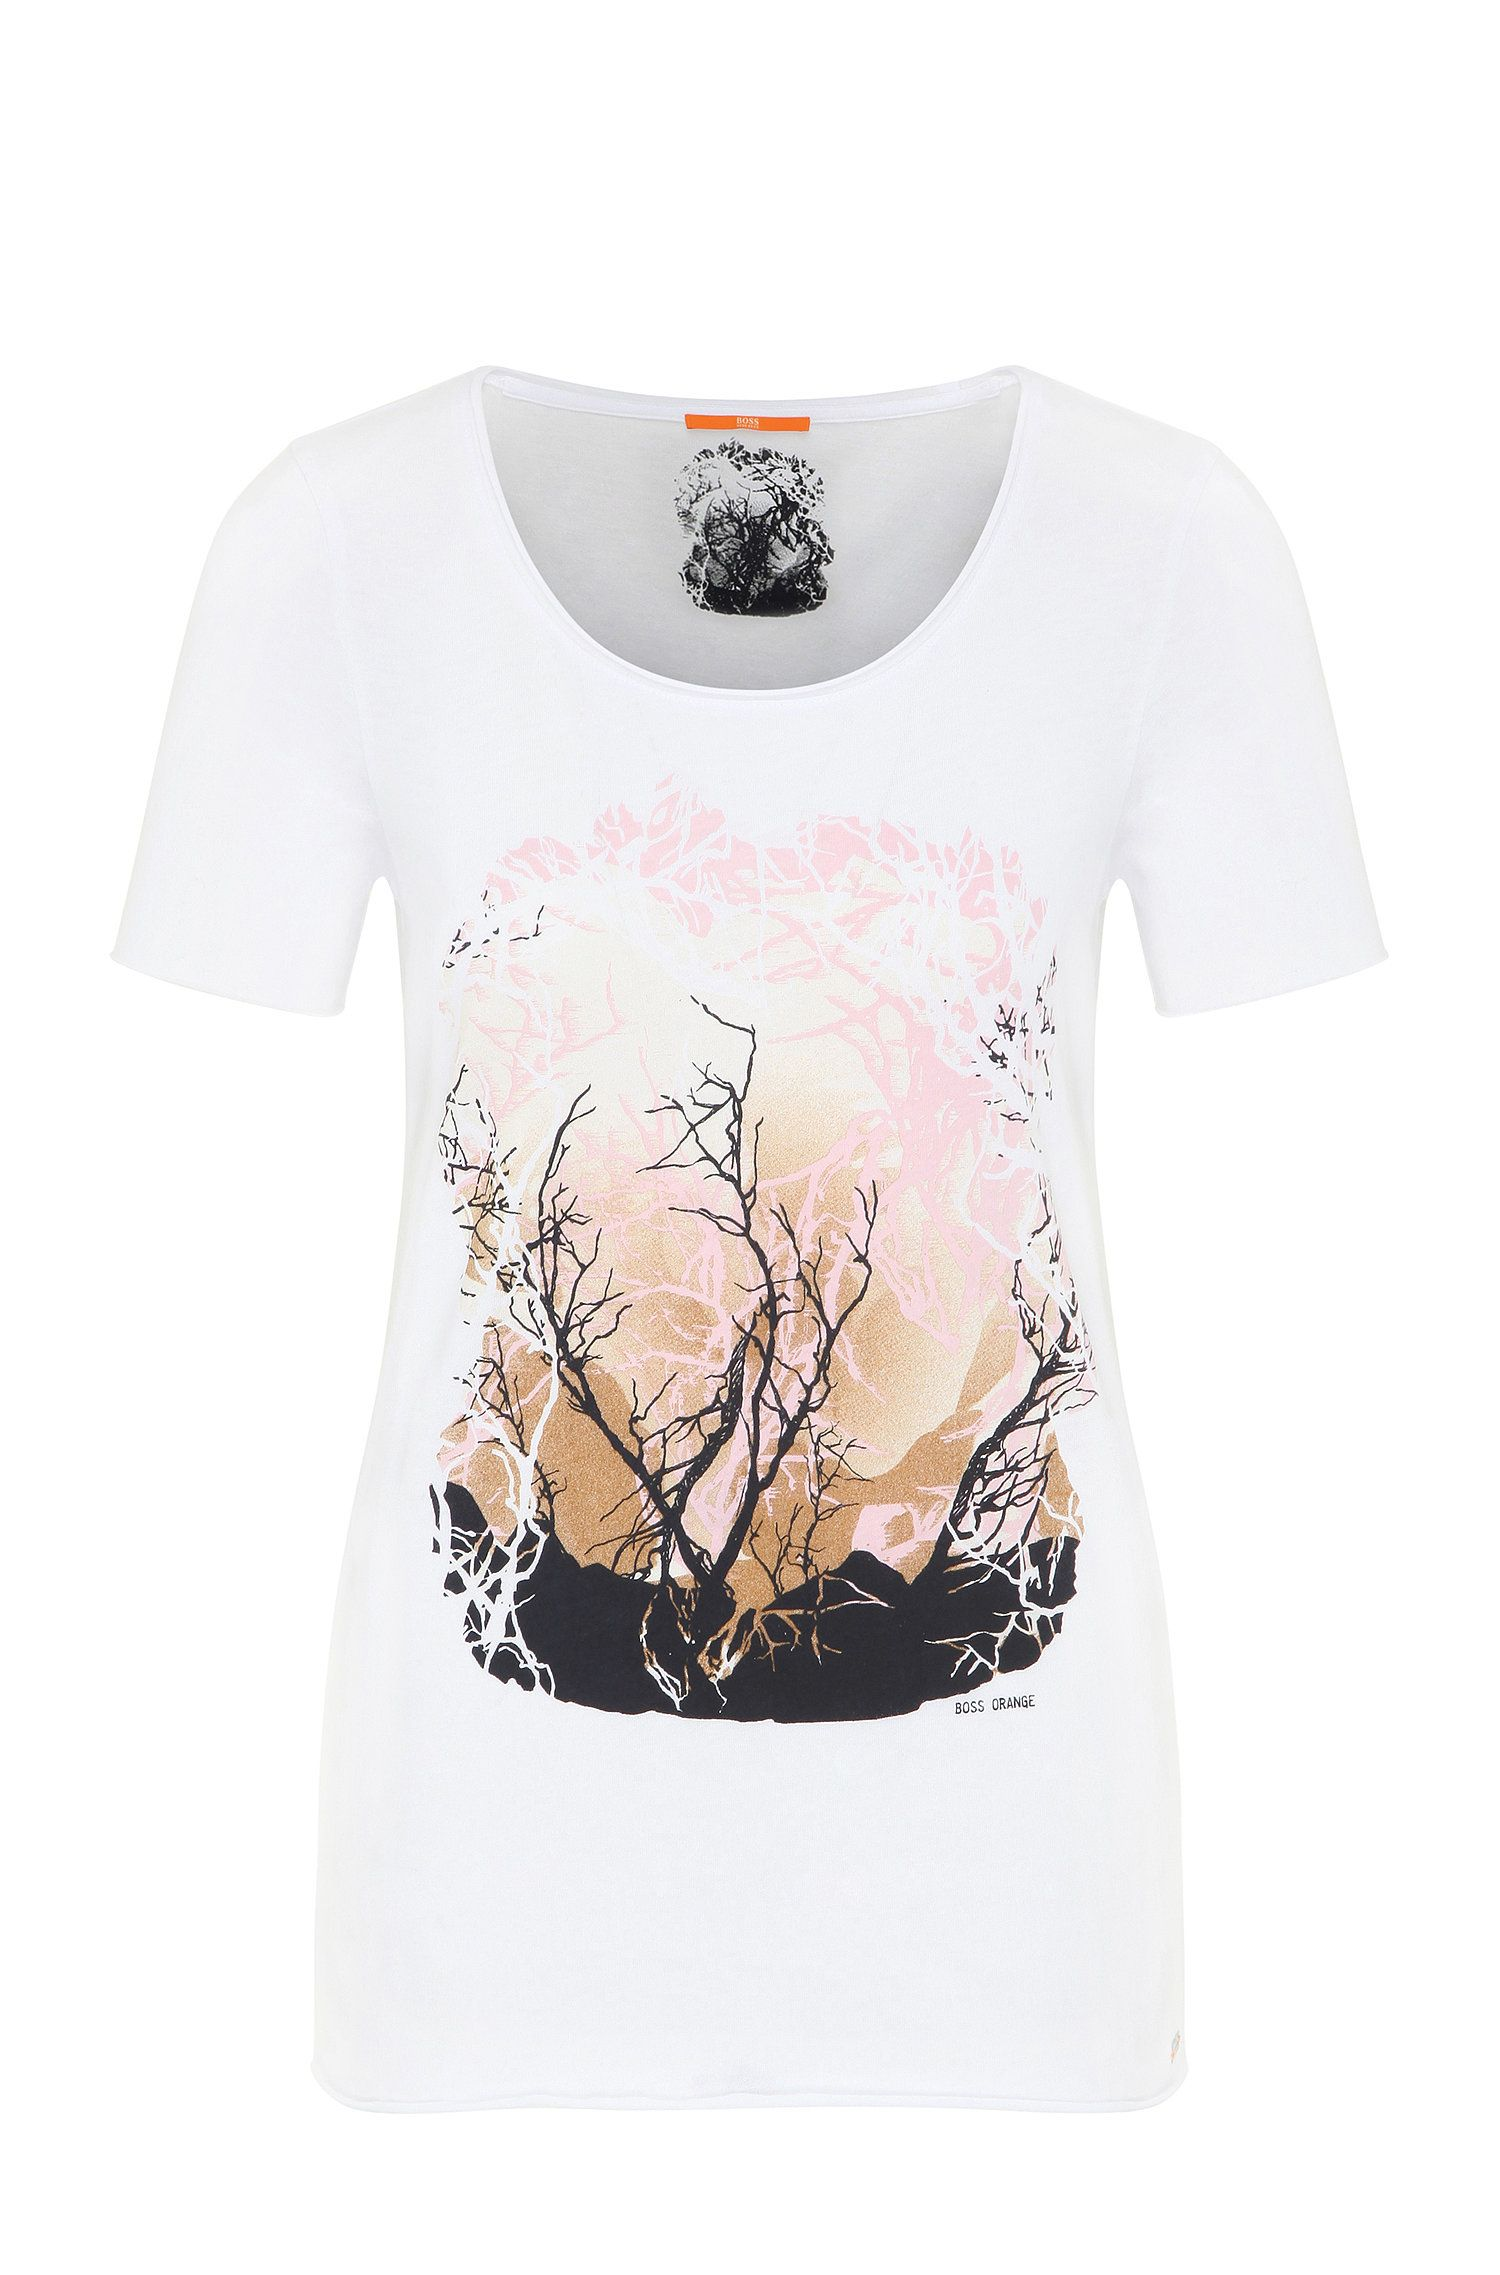 Camiseta slim fit en algodón y modal